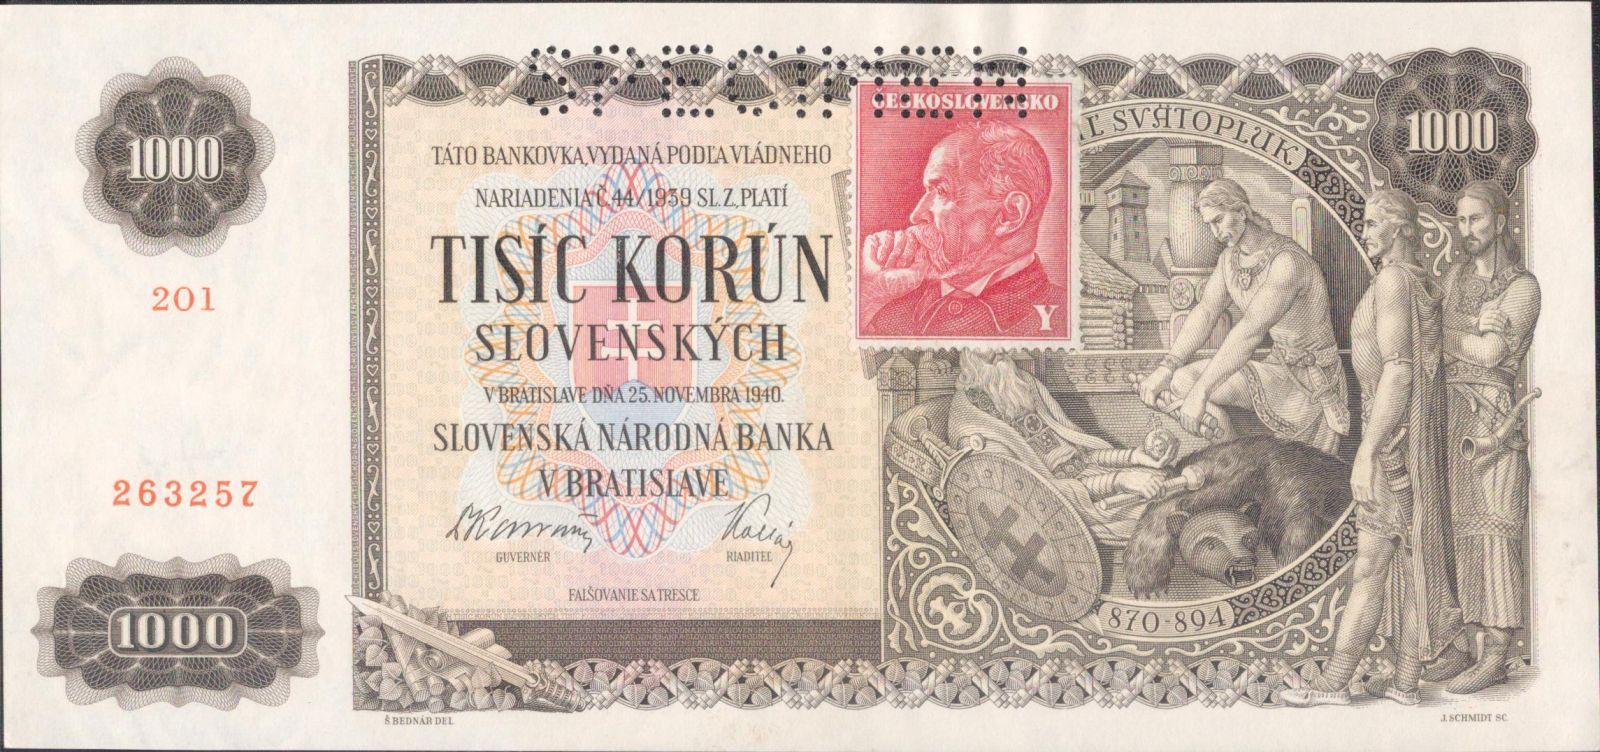 1000Ks/1940-kolek ČSR/, stav UNC perf. SPECIMEN nahoře, série 2O1